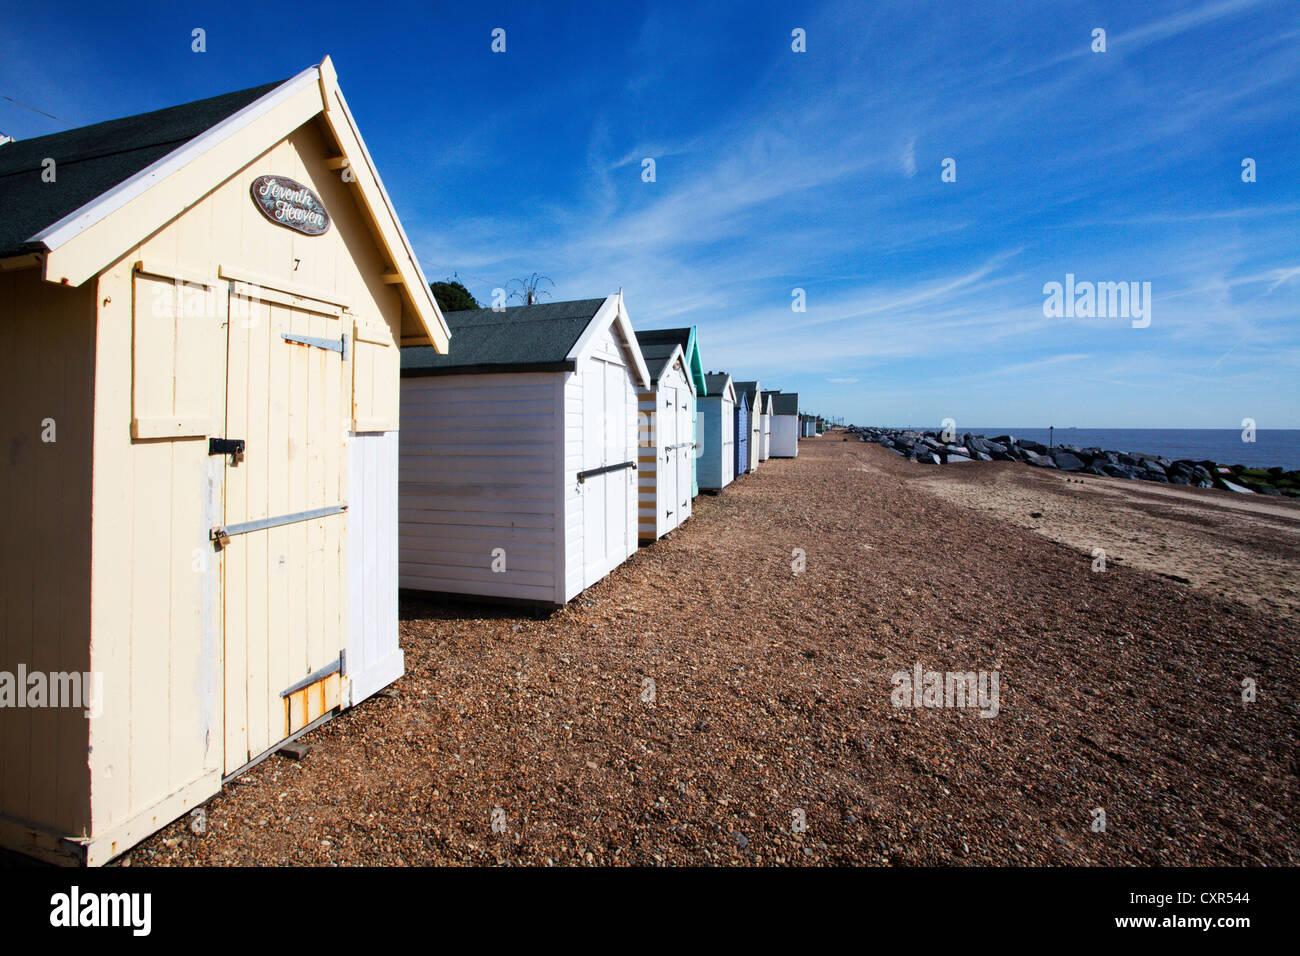 Beach Huts at Felixstowe Suffolk England - Stock Image